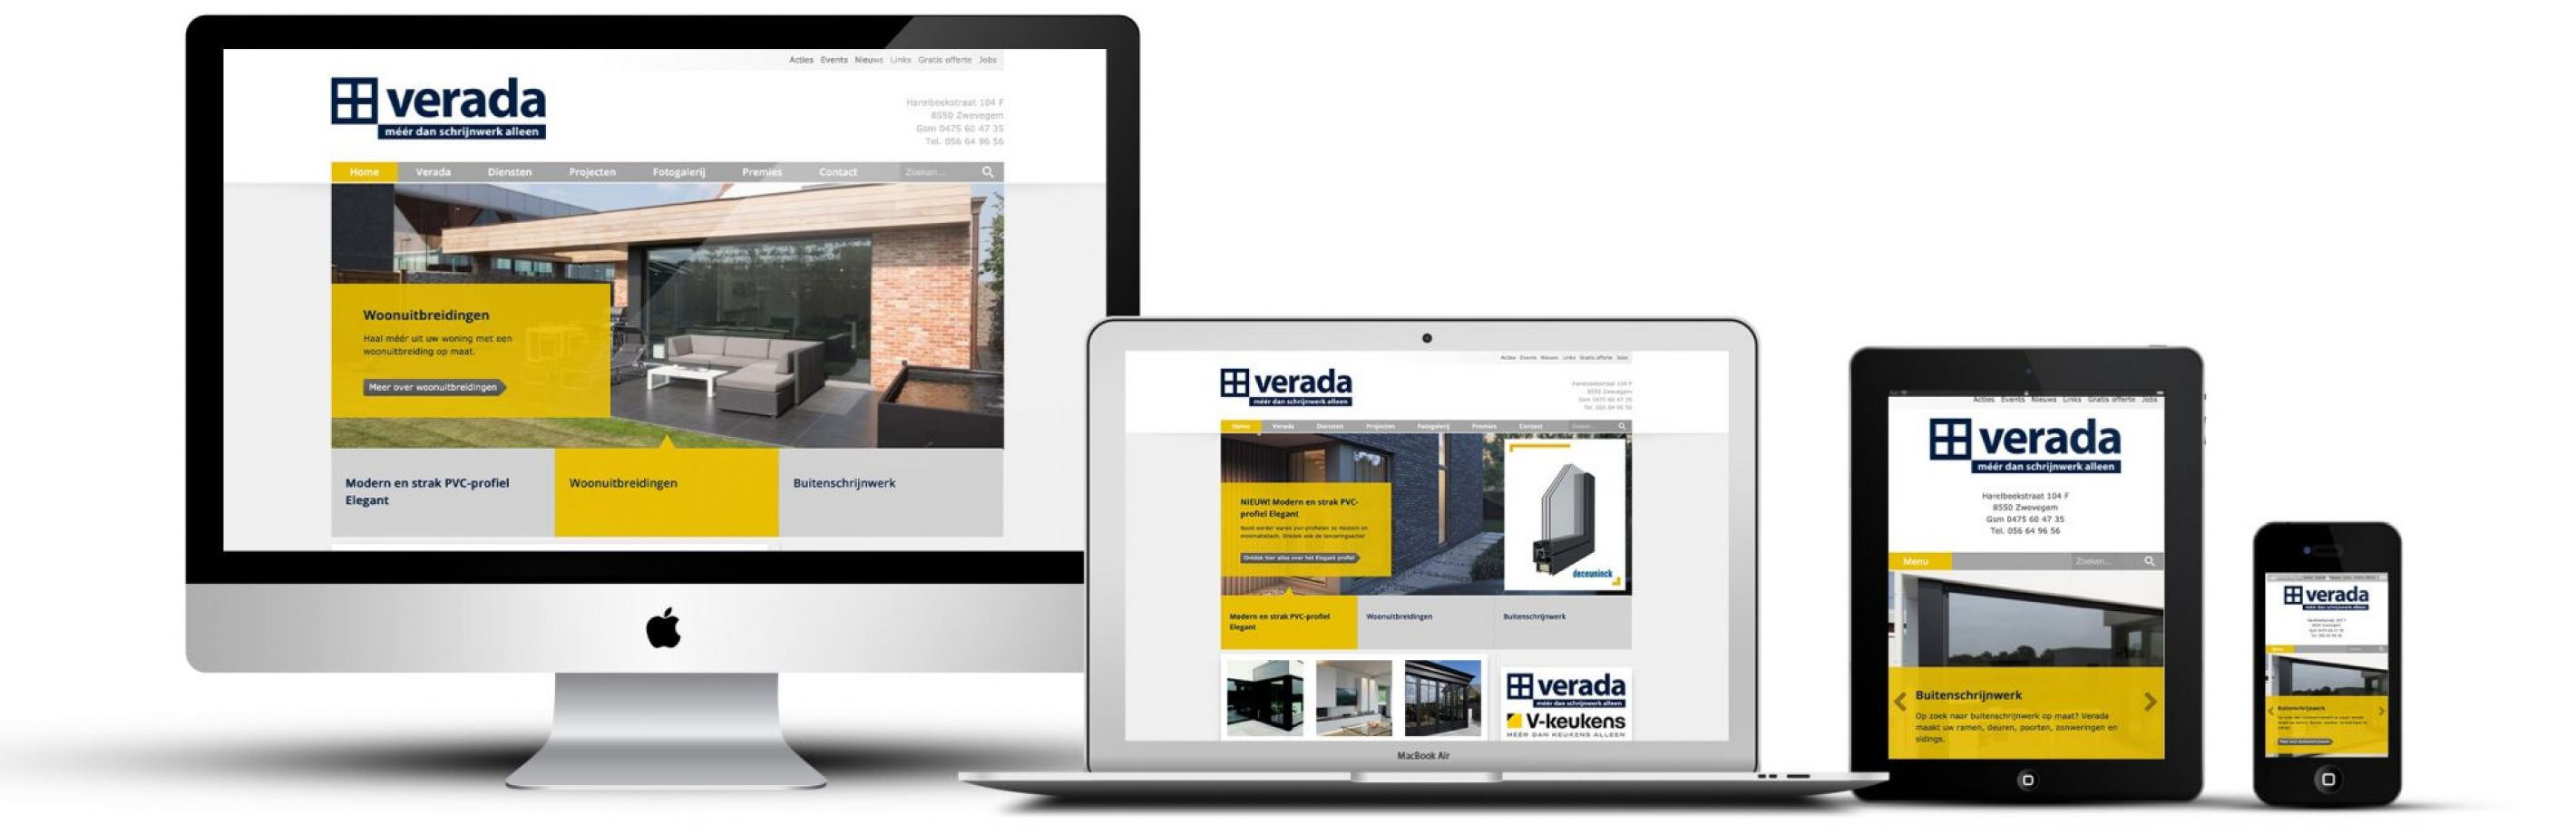 Verada website